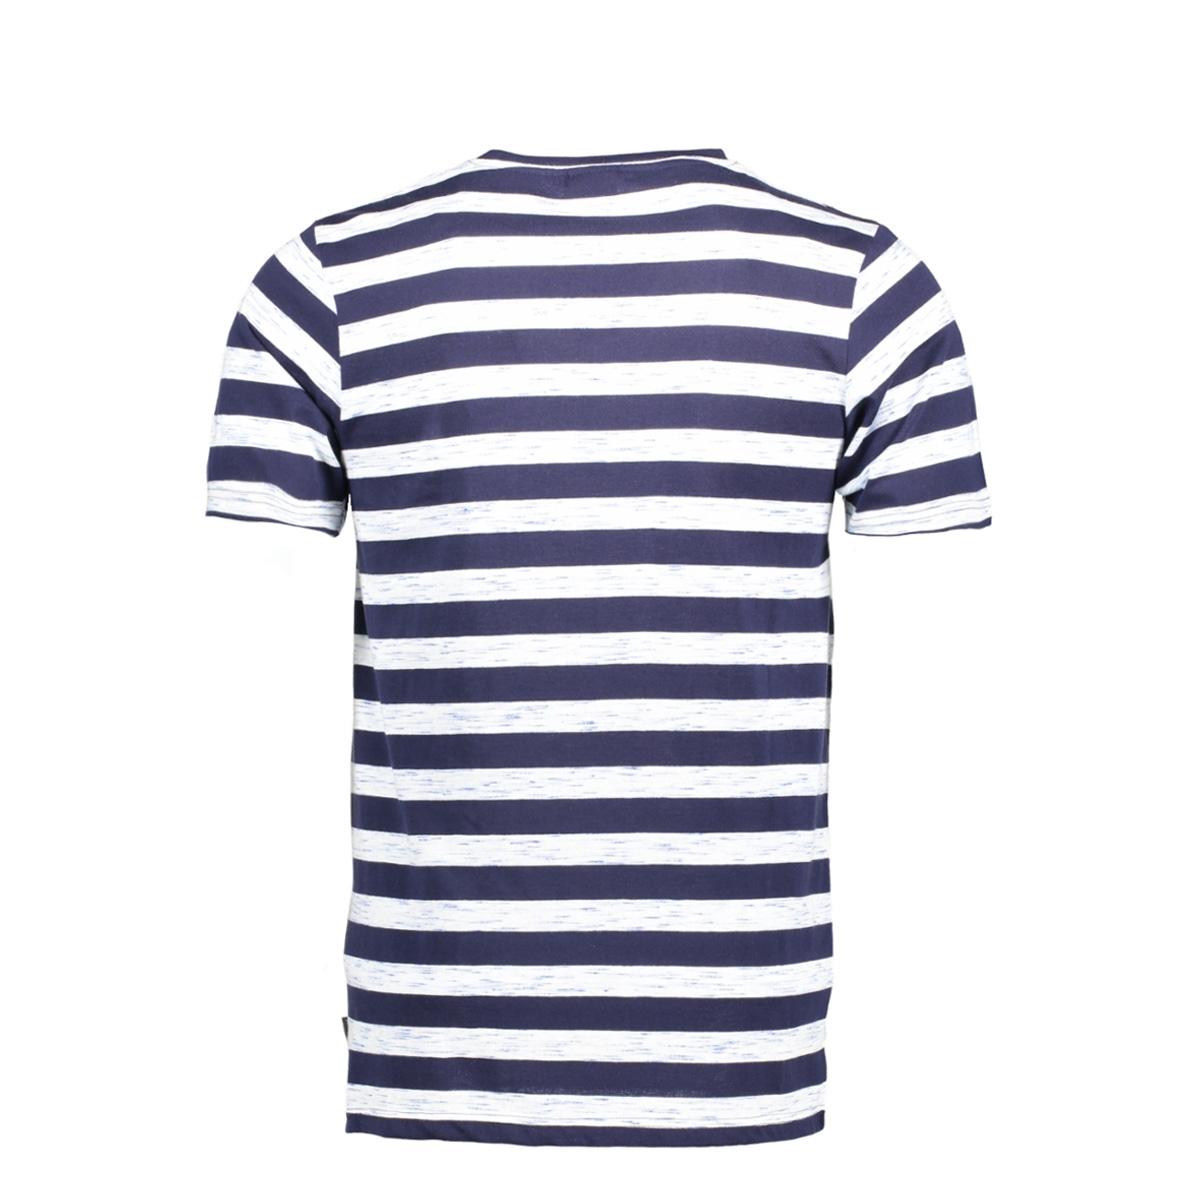 jorcinnema tee ss crew neck 12124523 jack & jones t-shirt total eclipse/slim fit w